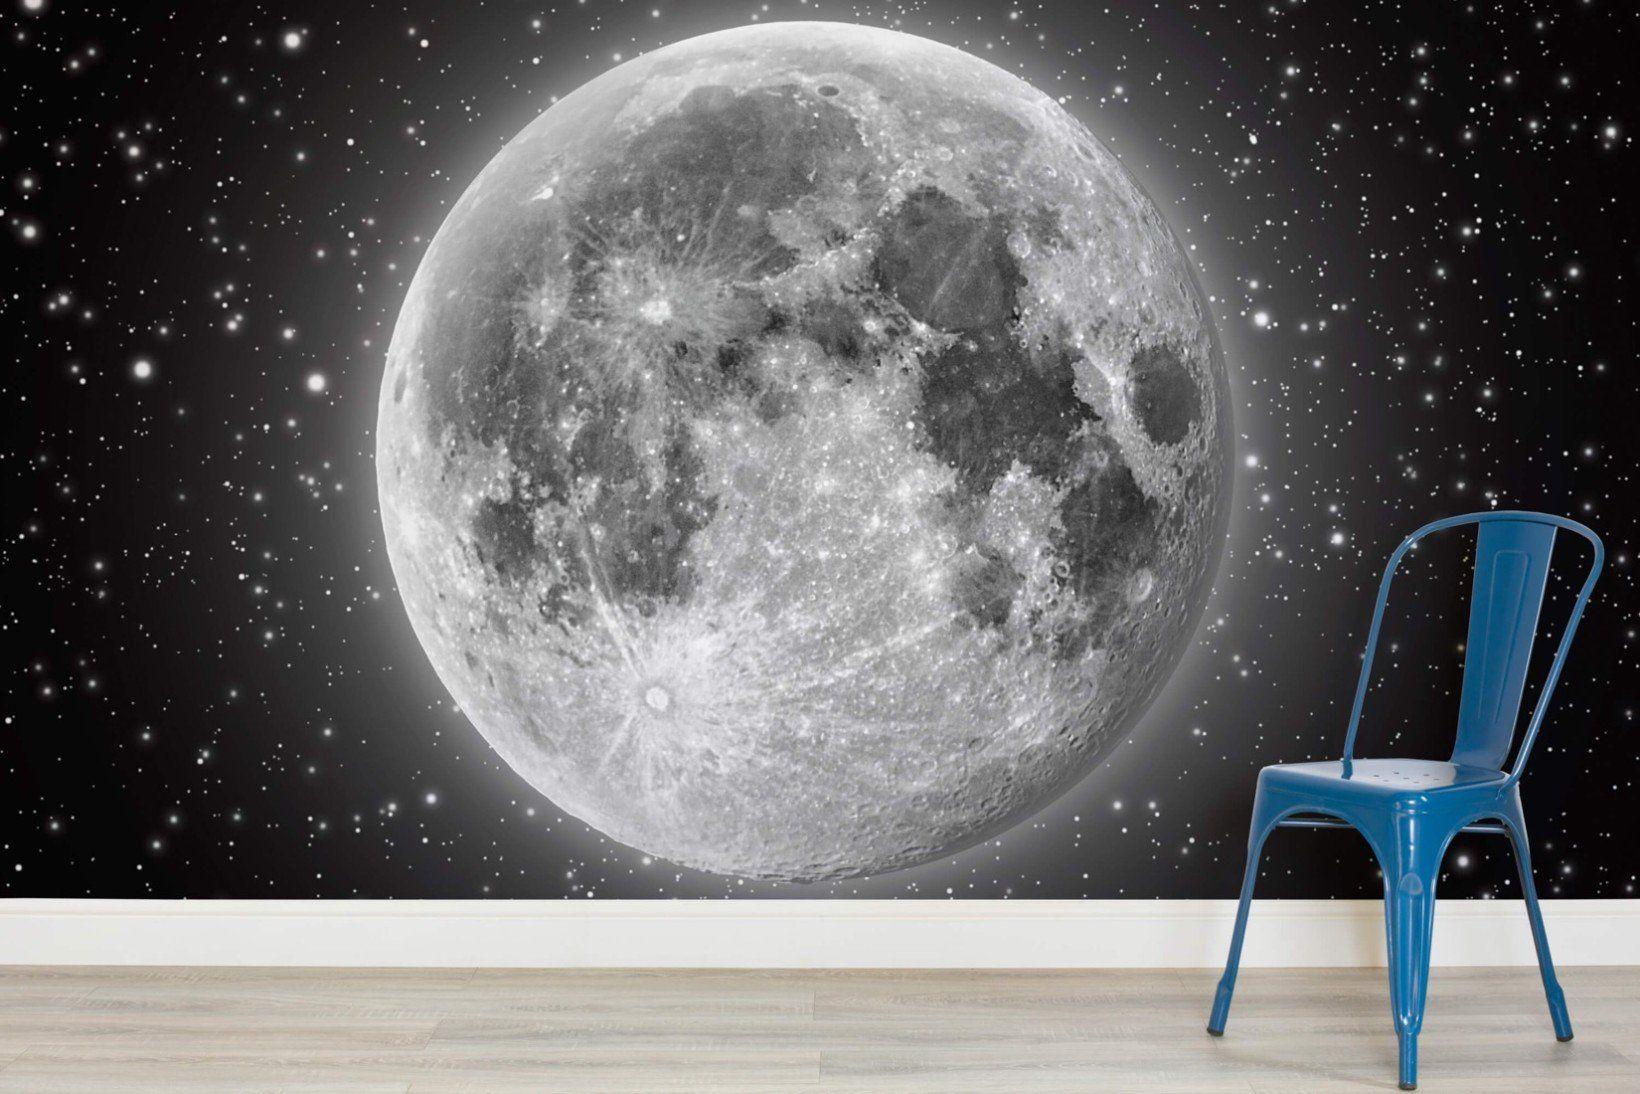 Moon and Stars Wallpaper Mural MuralsWallpaper in 2019